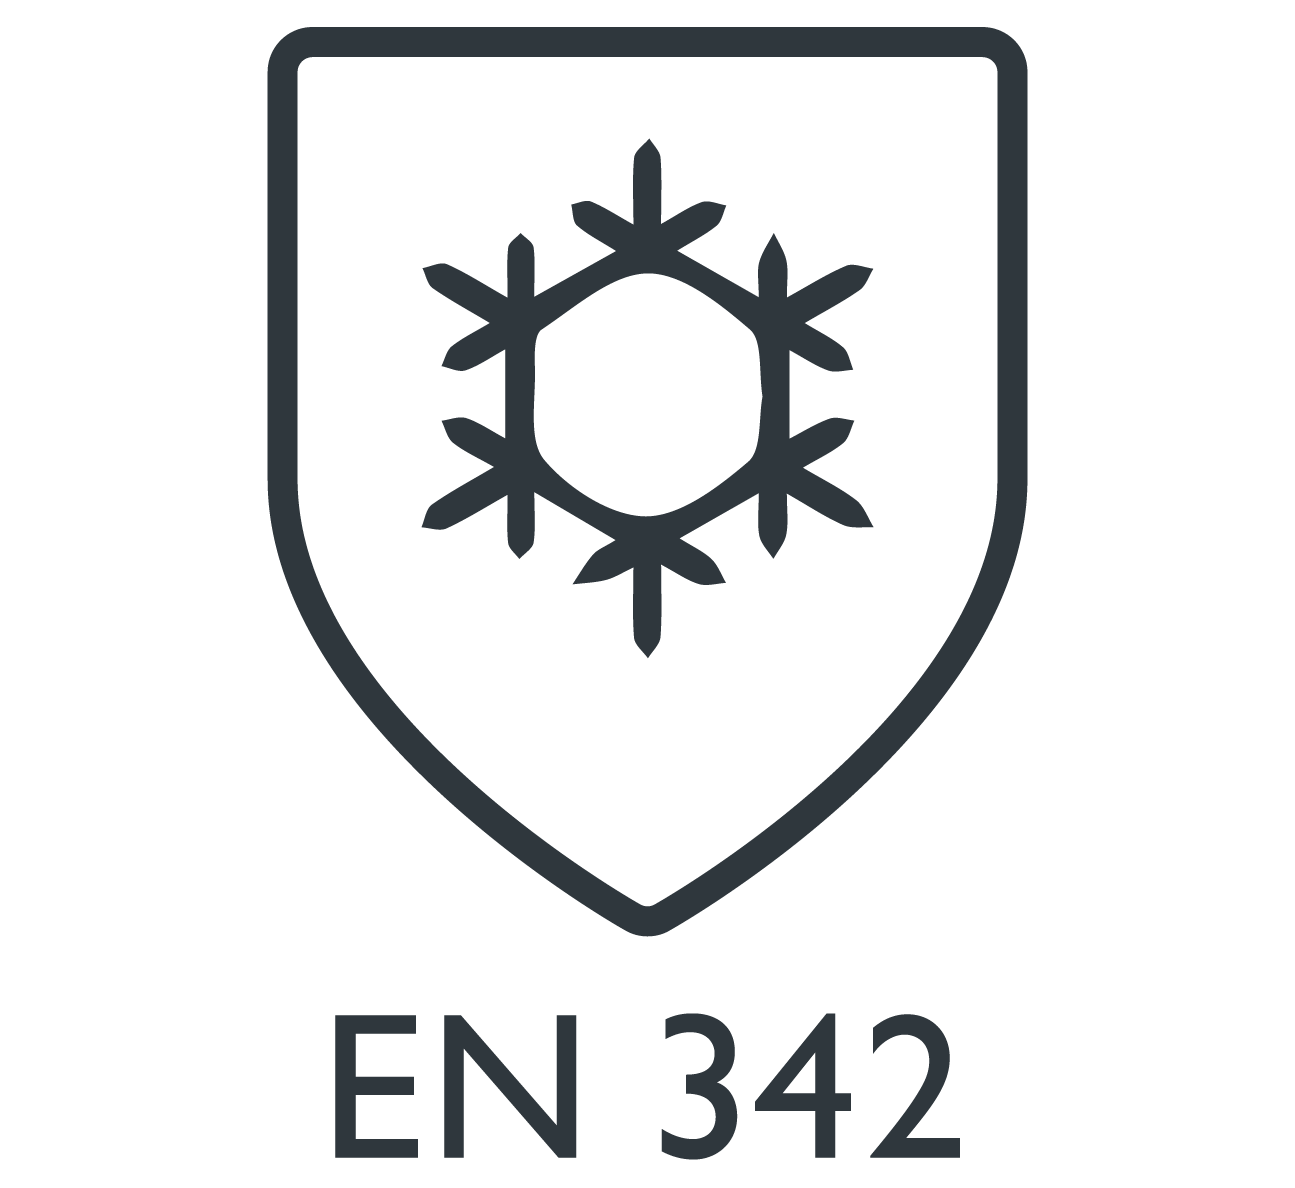 EN 342 protection garments against cold environment